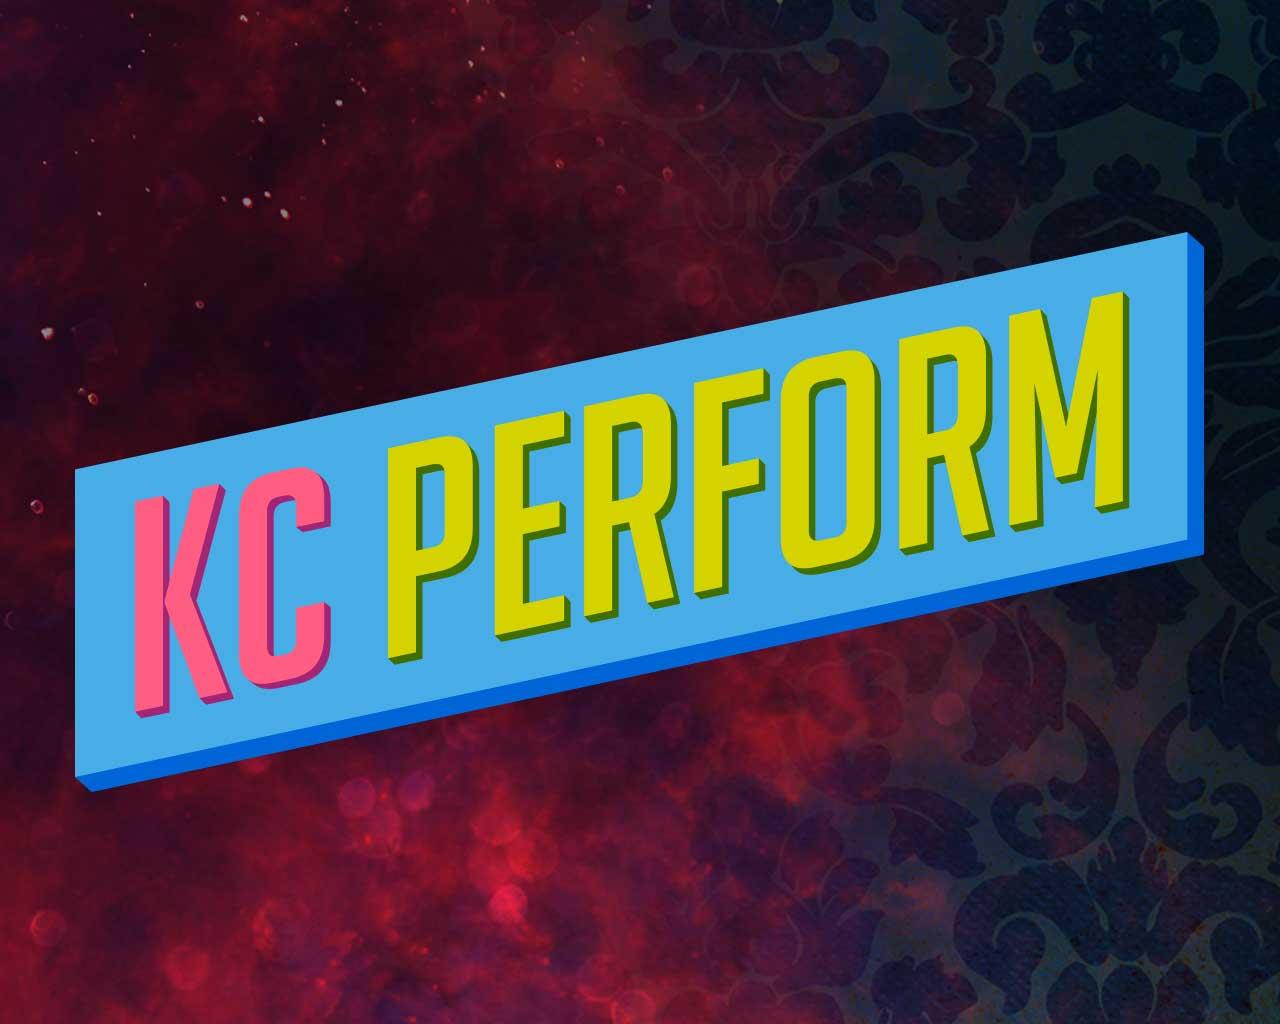 KC Perform